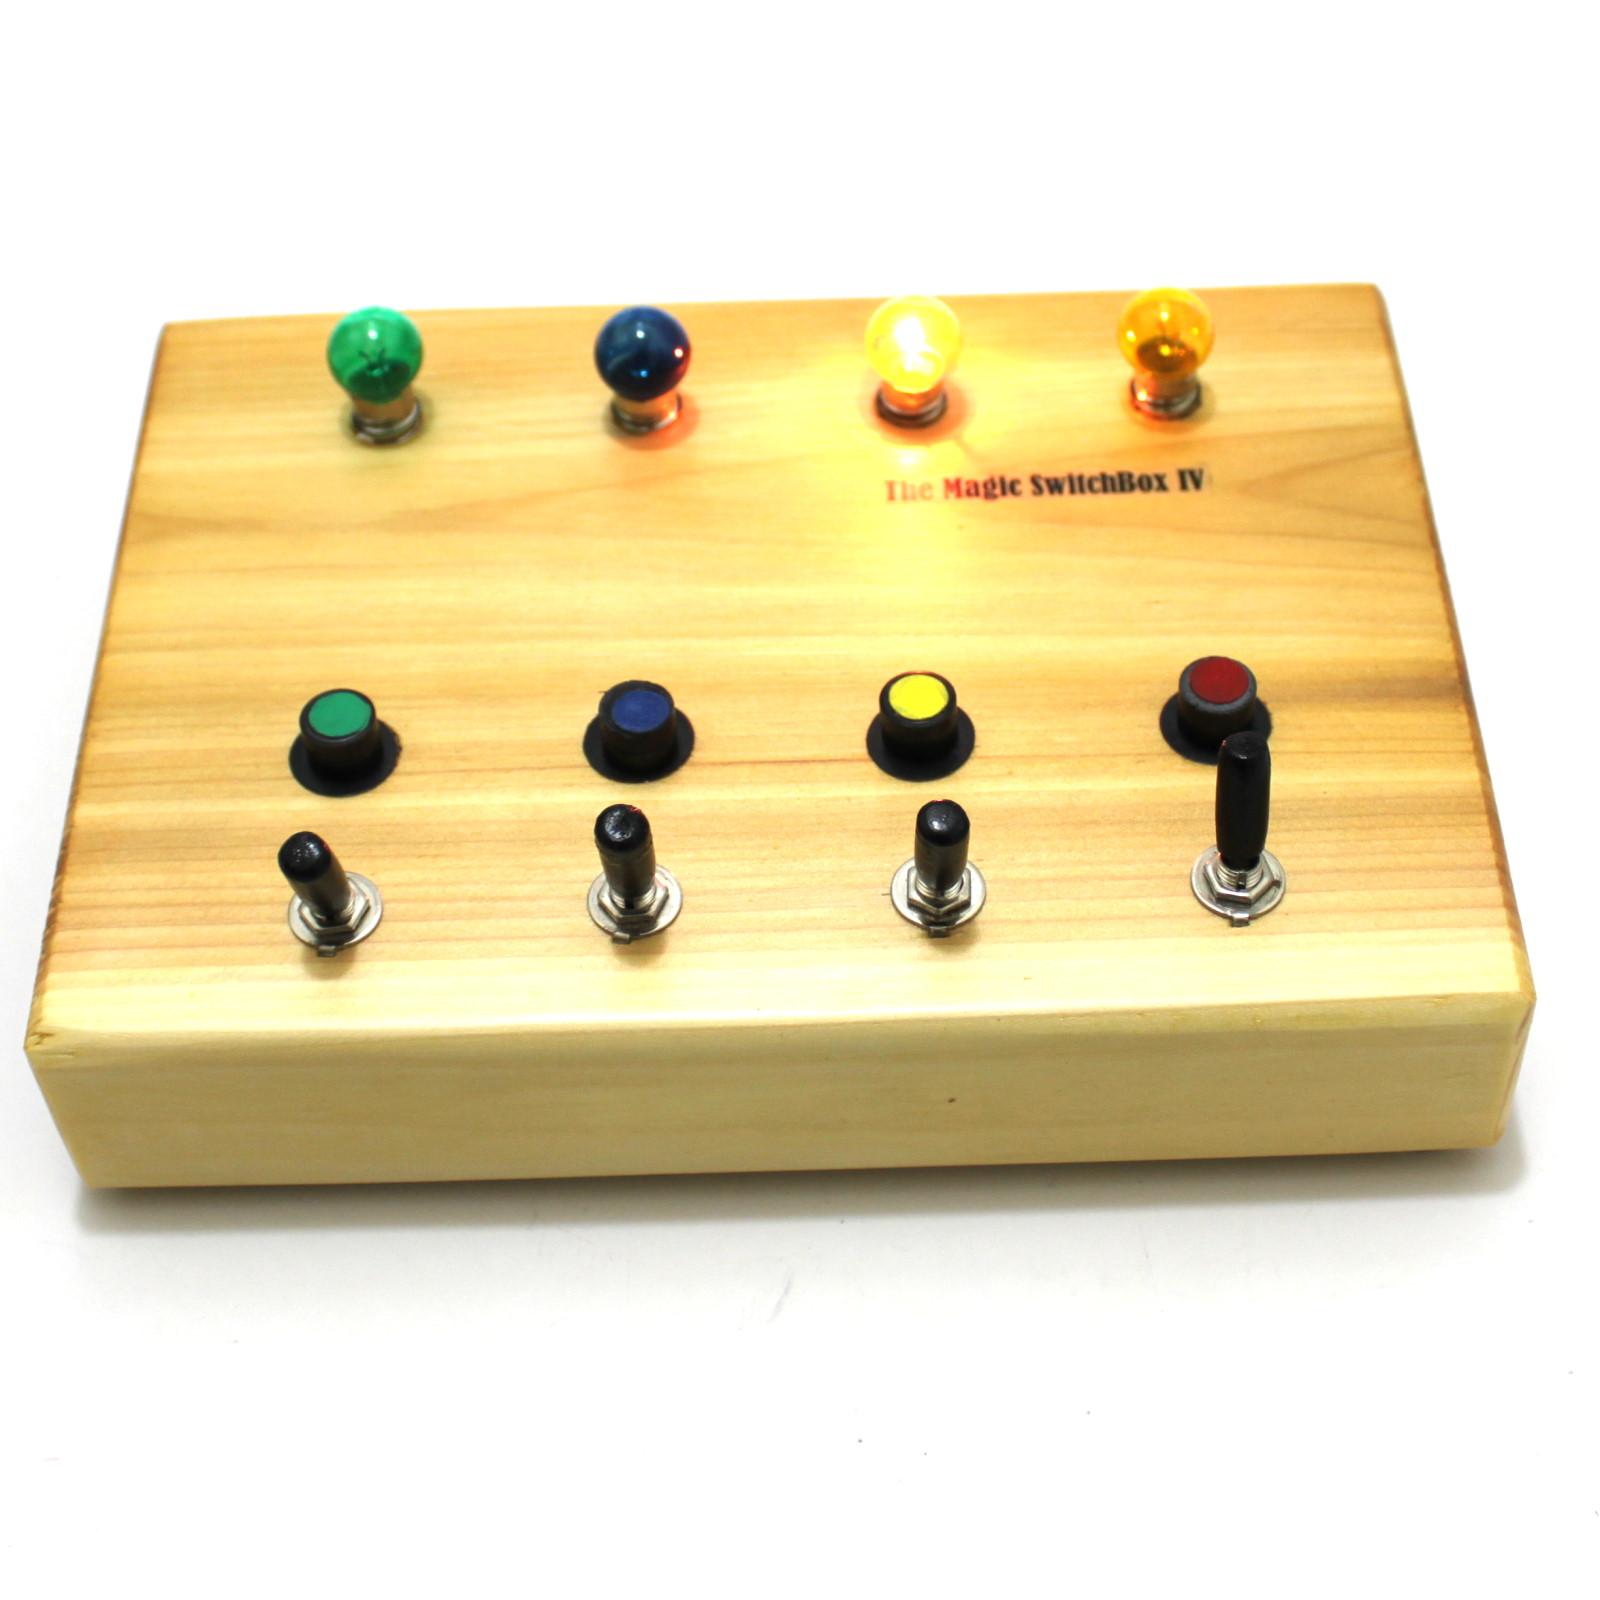 Magic Switchbox IV by Jaques